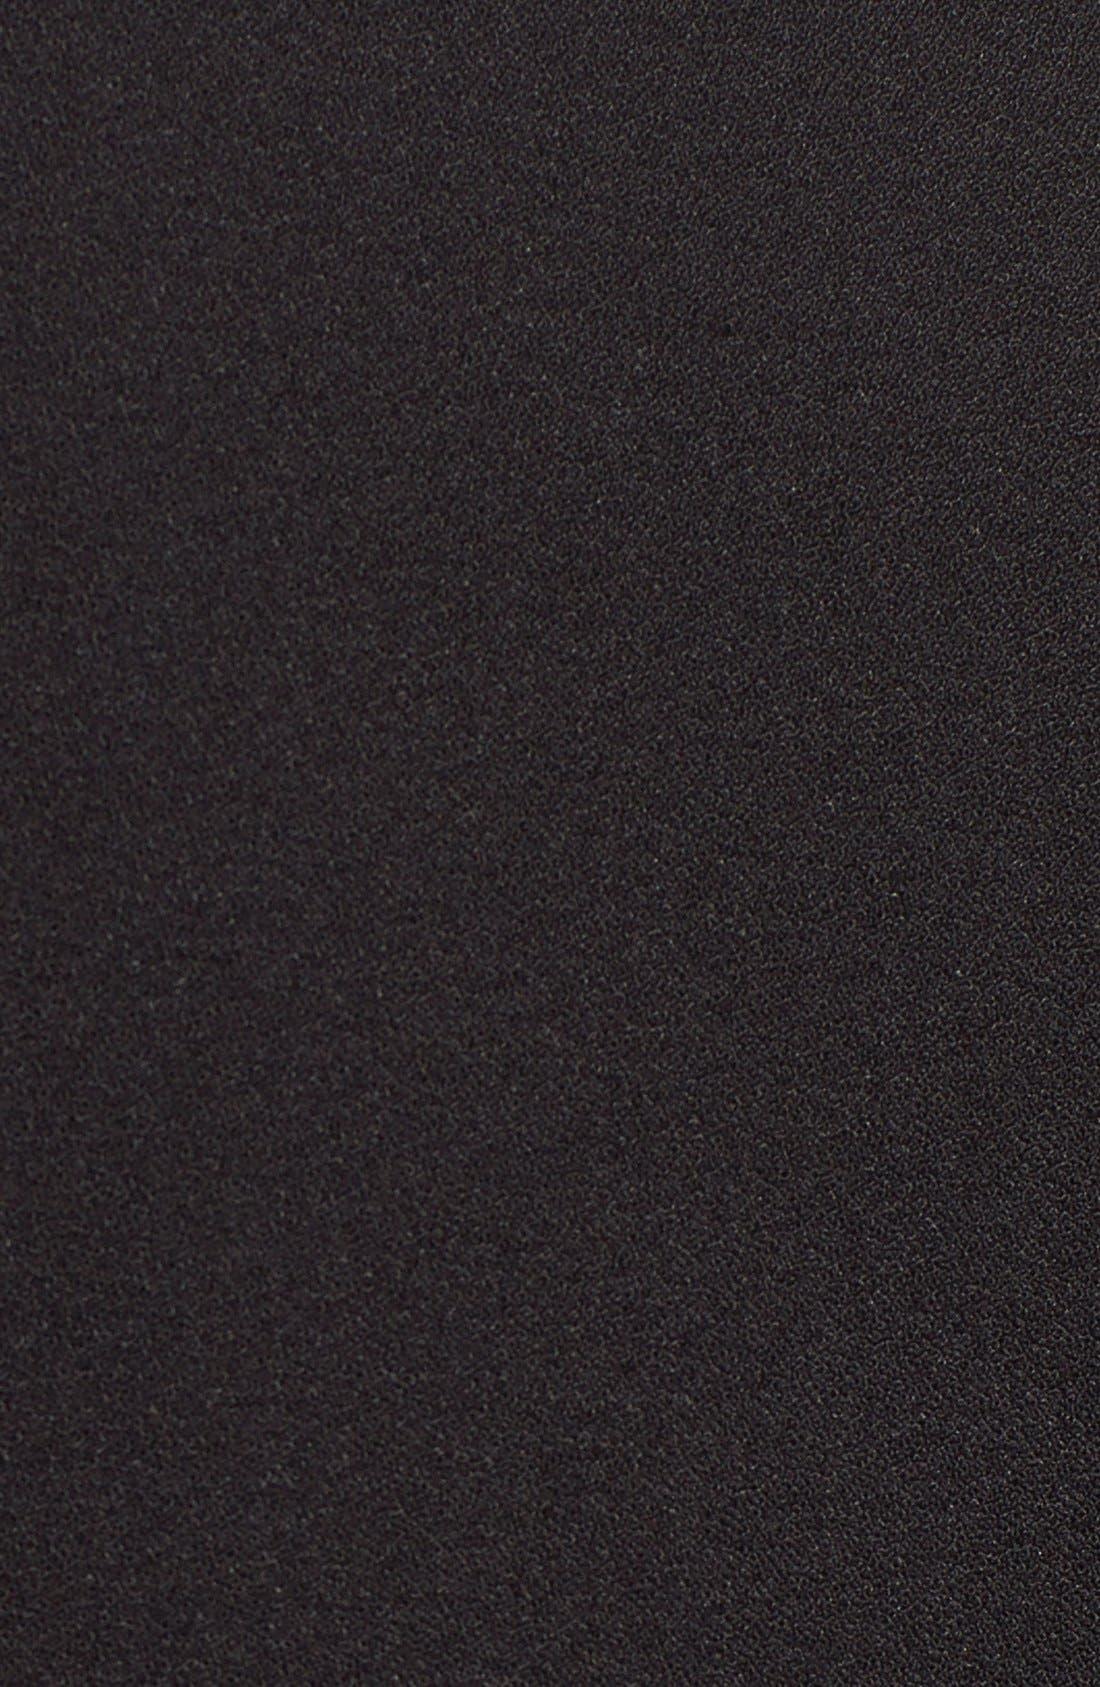 FELICITY & COCO, Devery Crepe Shift Dress, Alternate thumbnail 7, color, 001